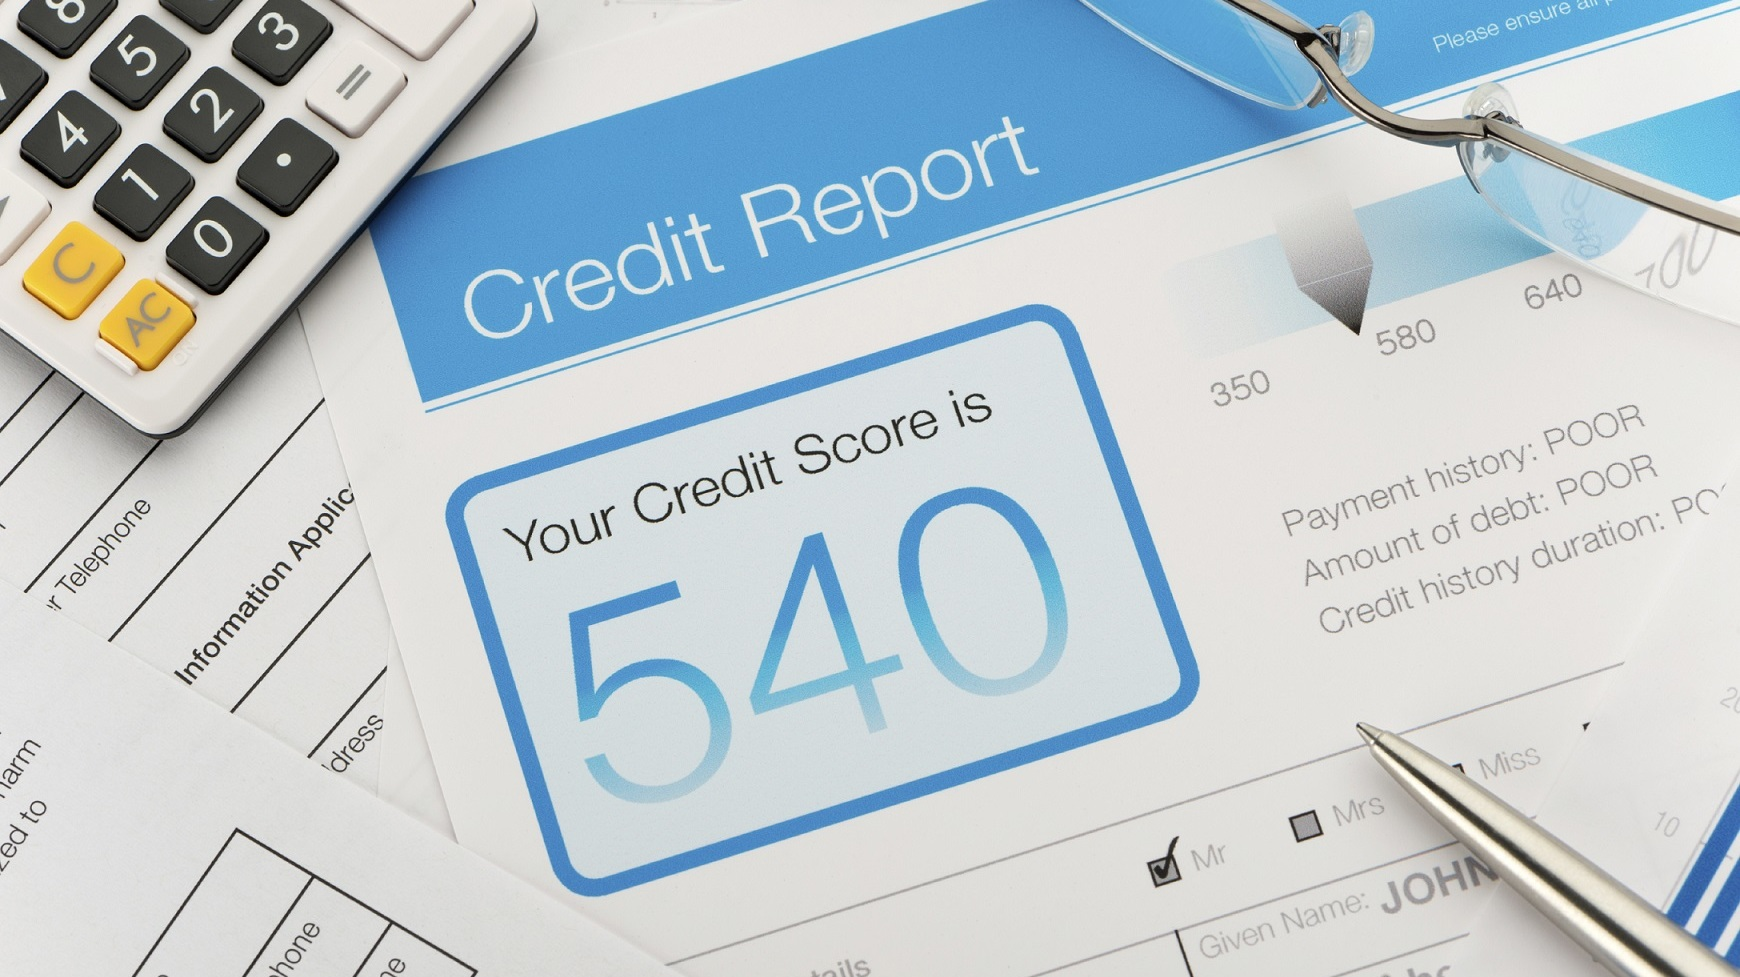 Don't Let Poor Credit Bring You Down!